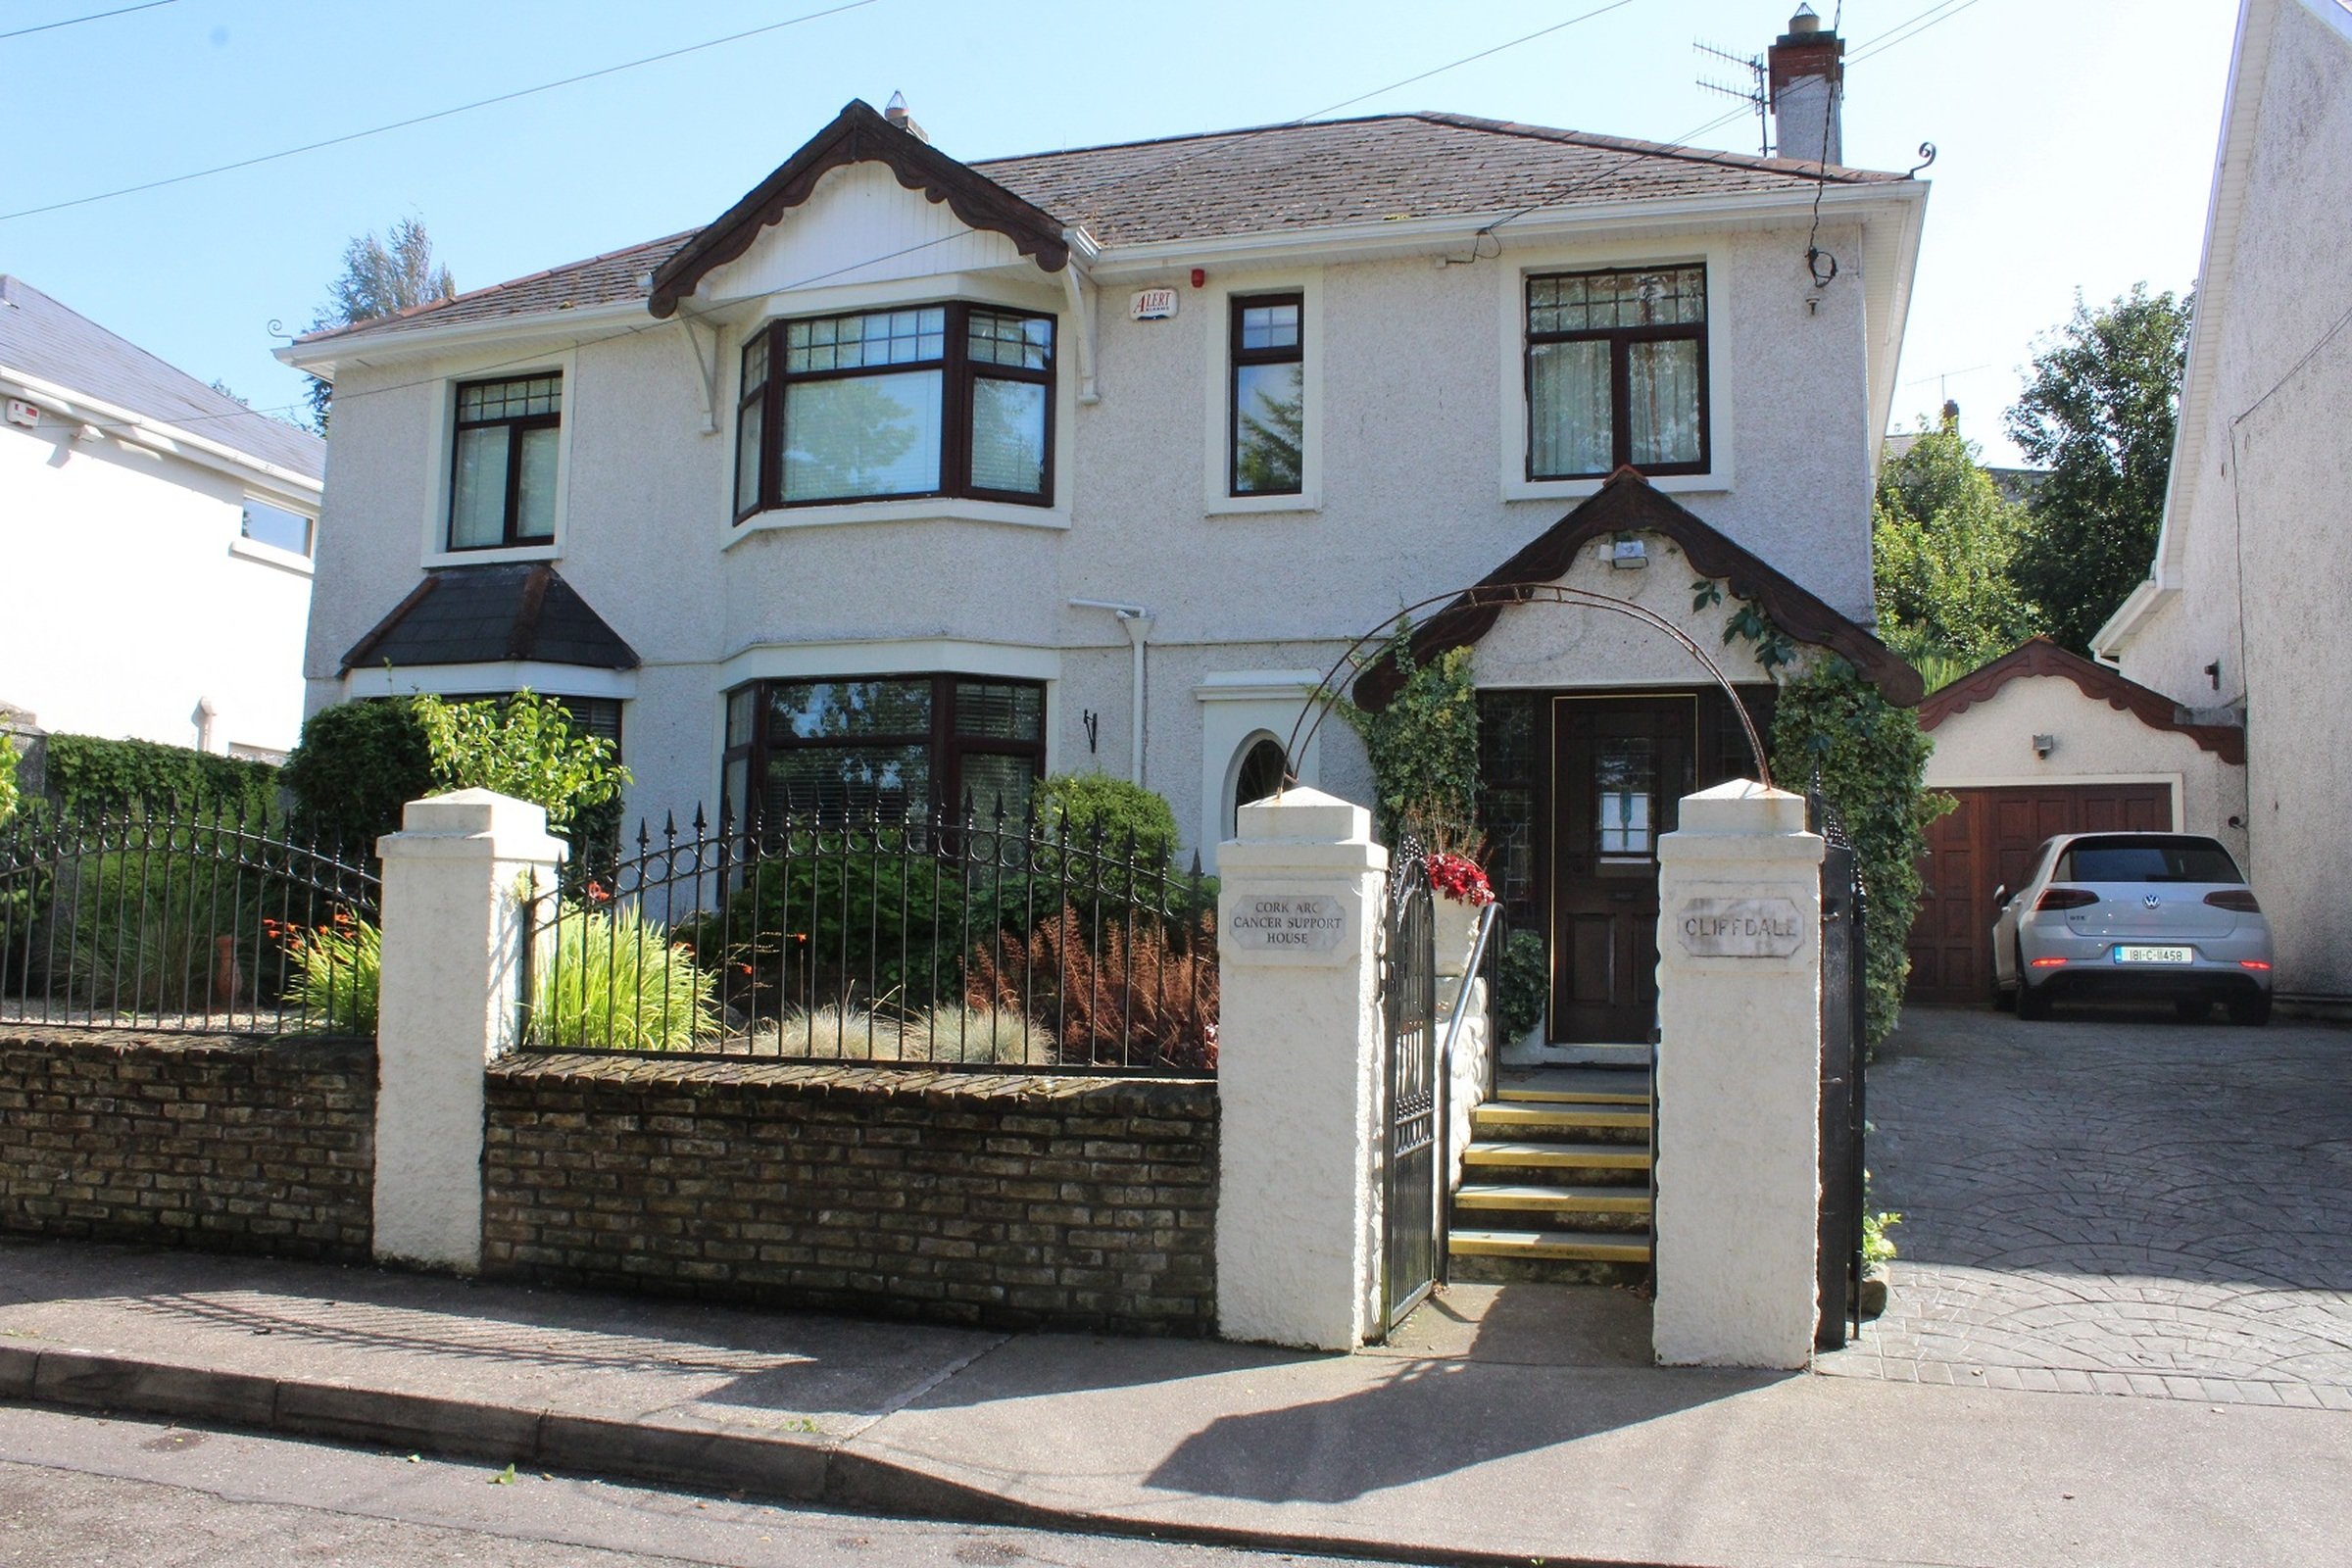 Cliffdale, 5 O'Donovan Rossa Road, Cork City, Co. Cork